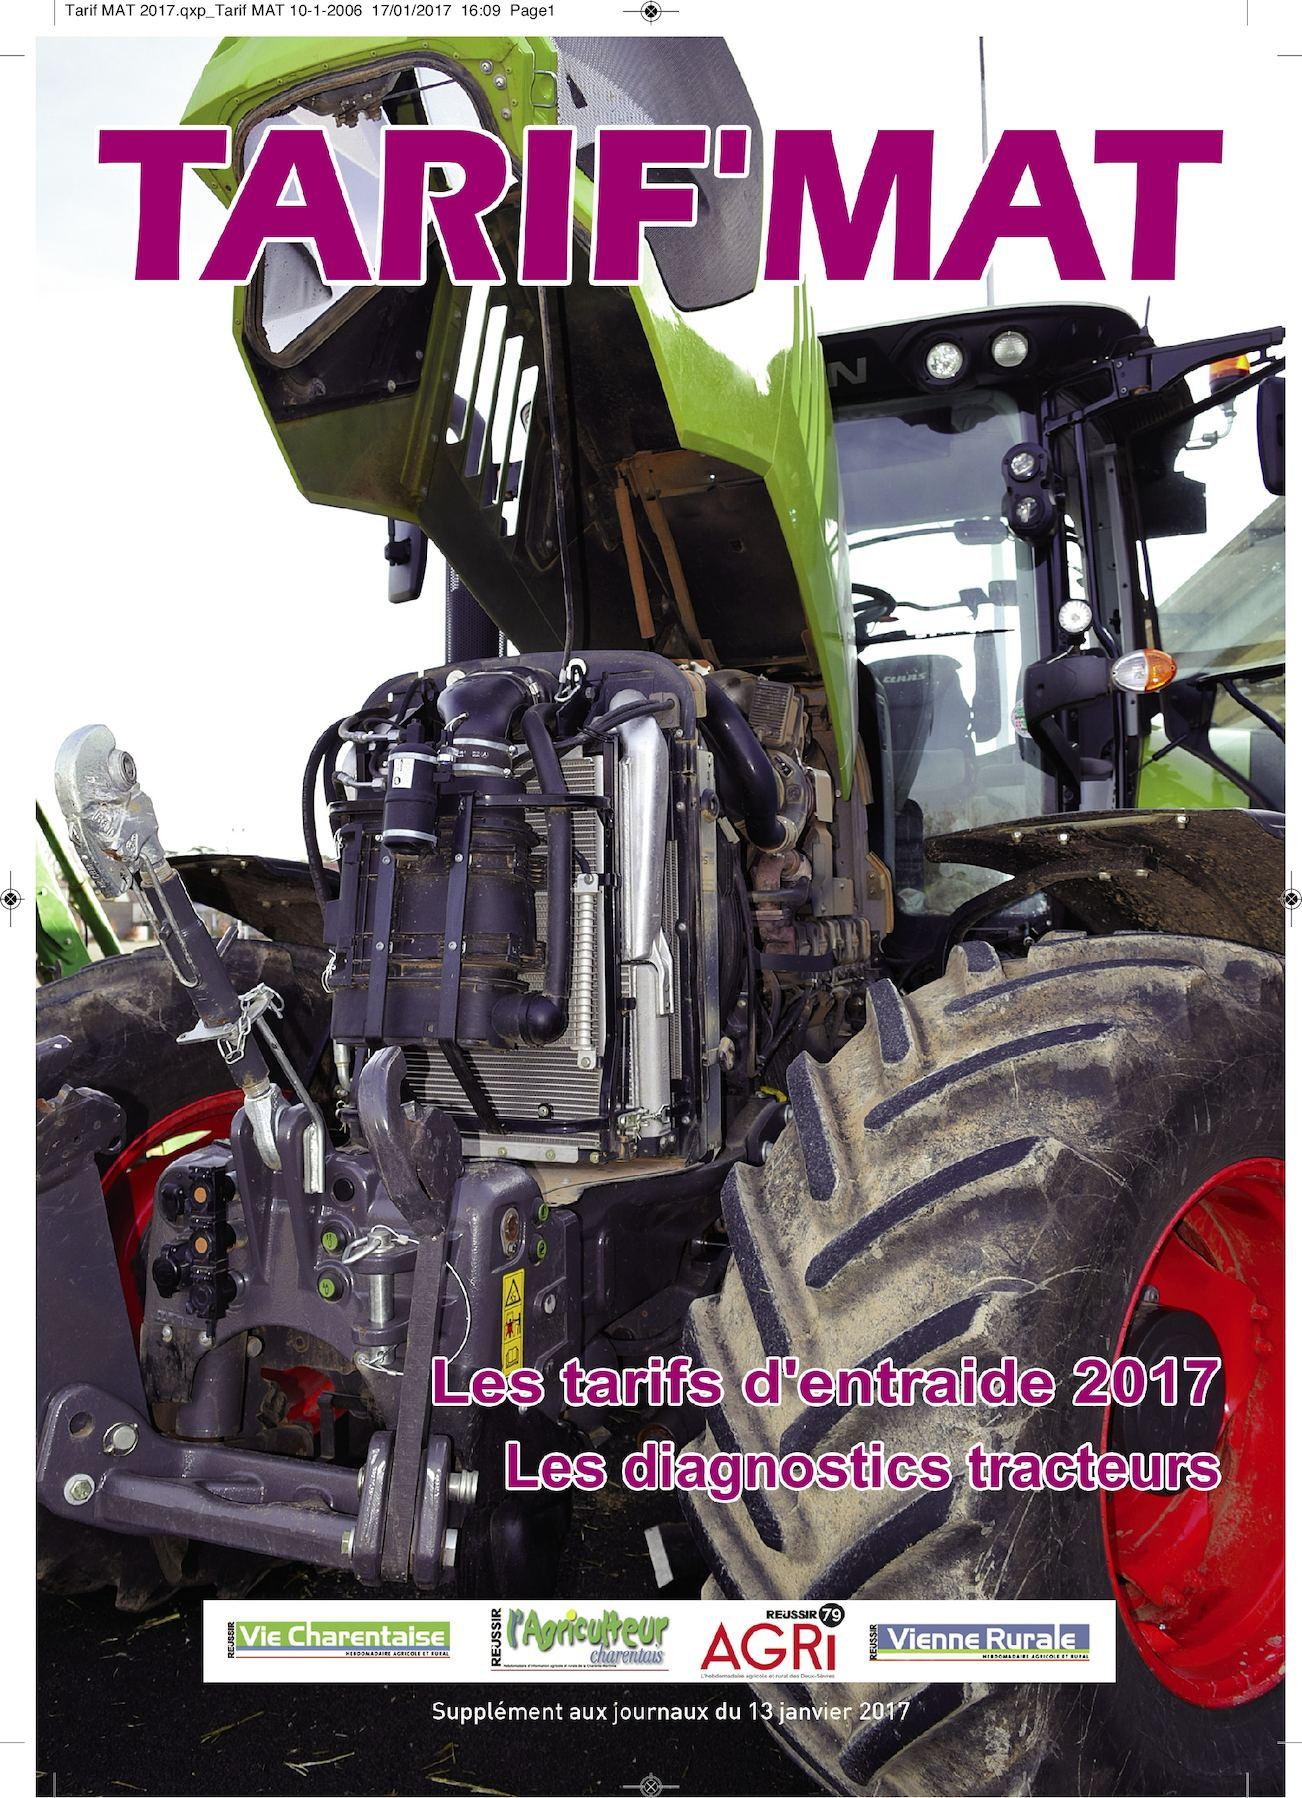 Calam o tarif mat 2017 - Chambre agriculture poitou charentes ...